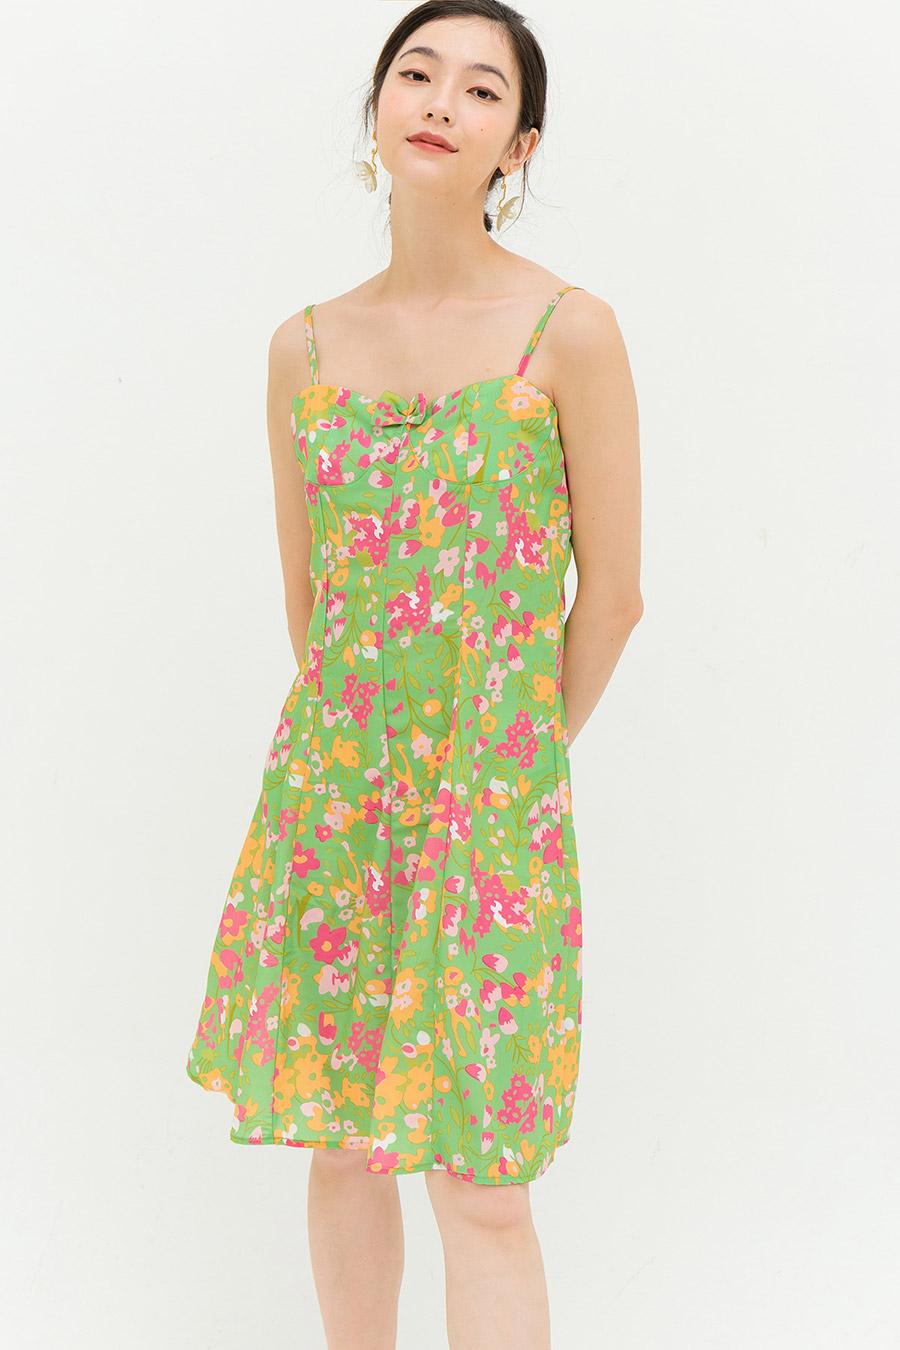 *SALE* CARTER DRESS - PINE FLEUR